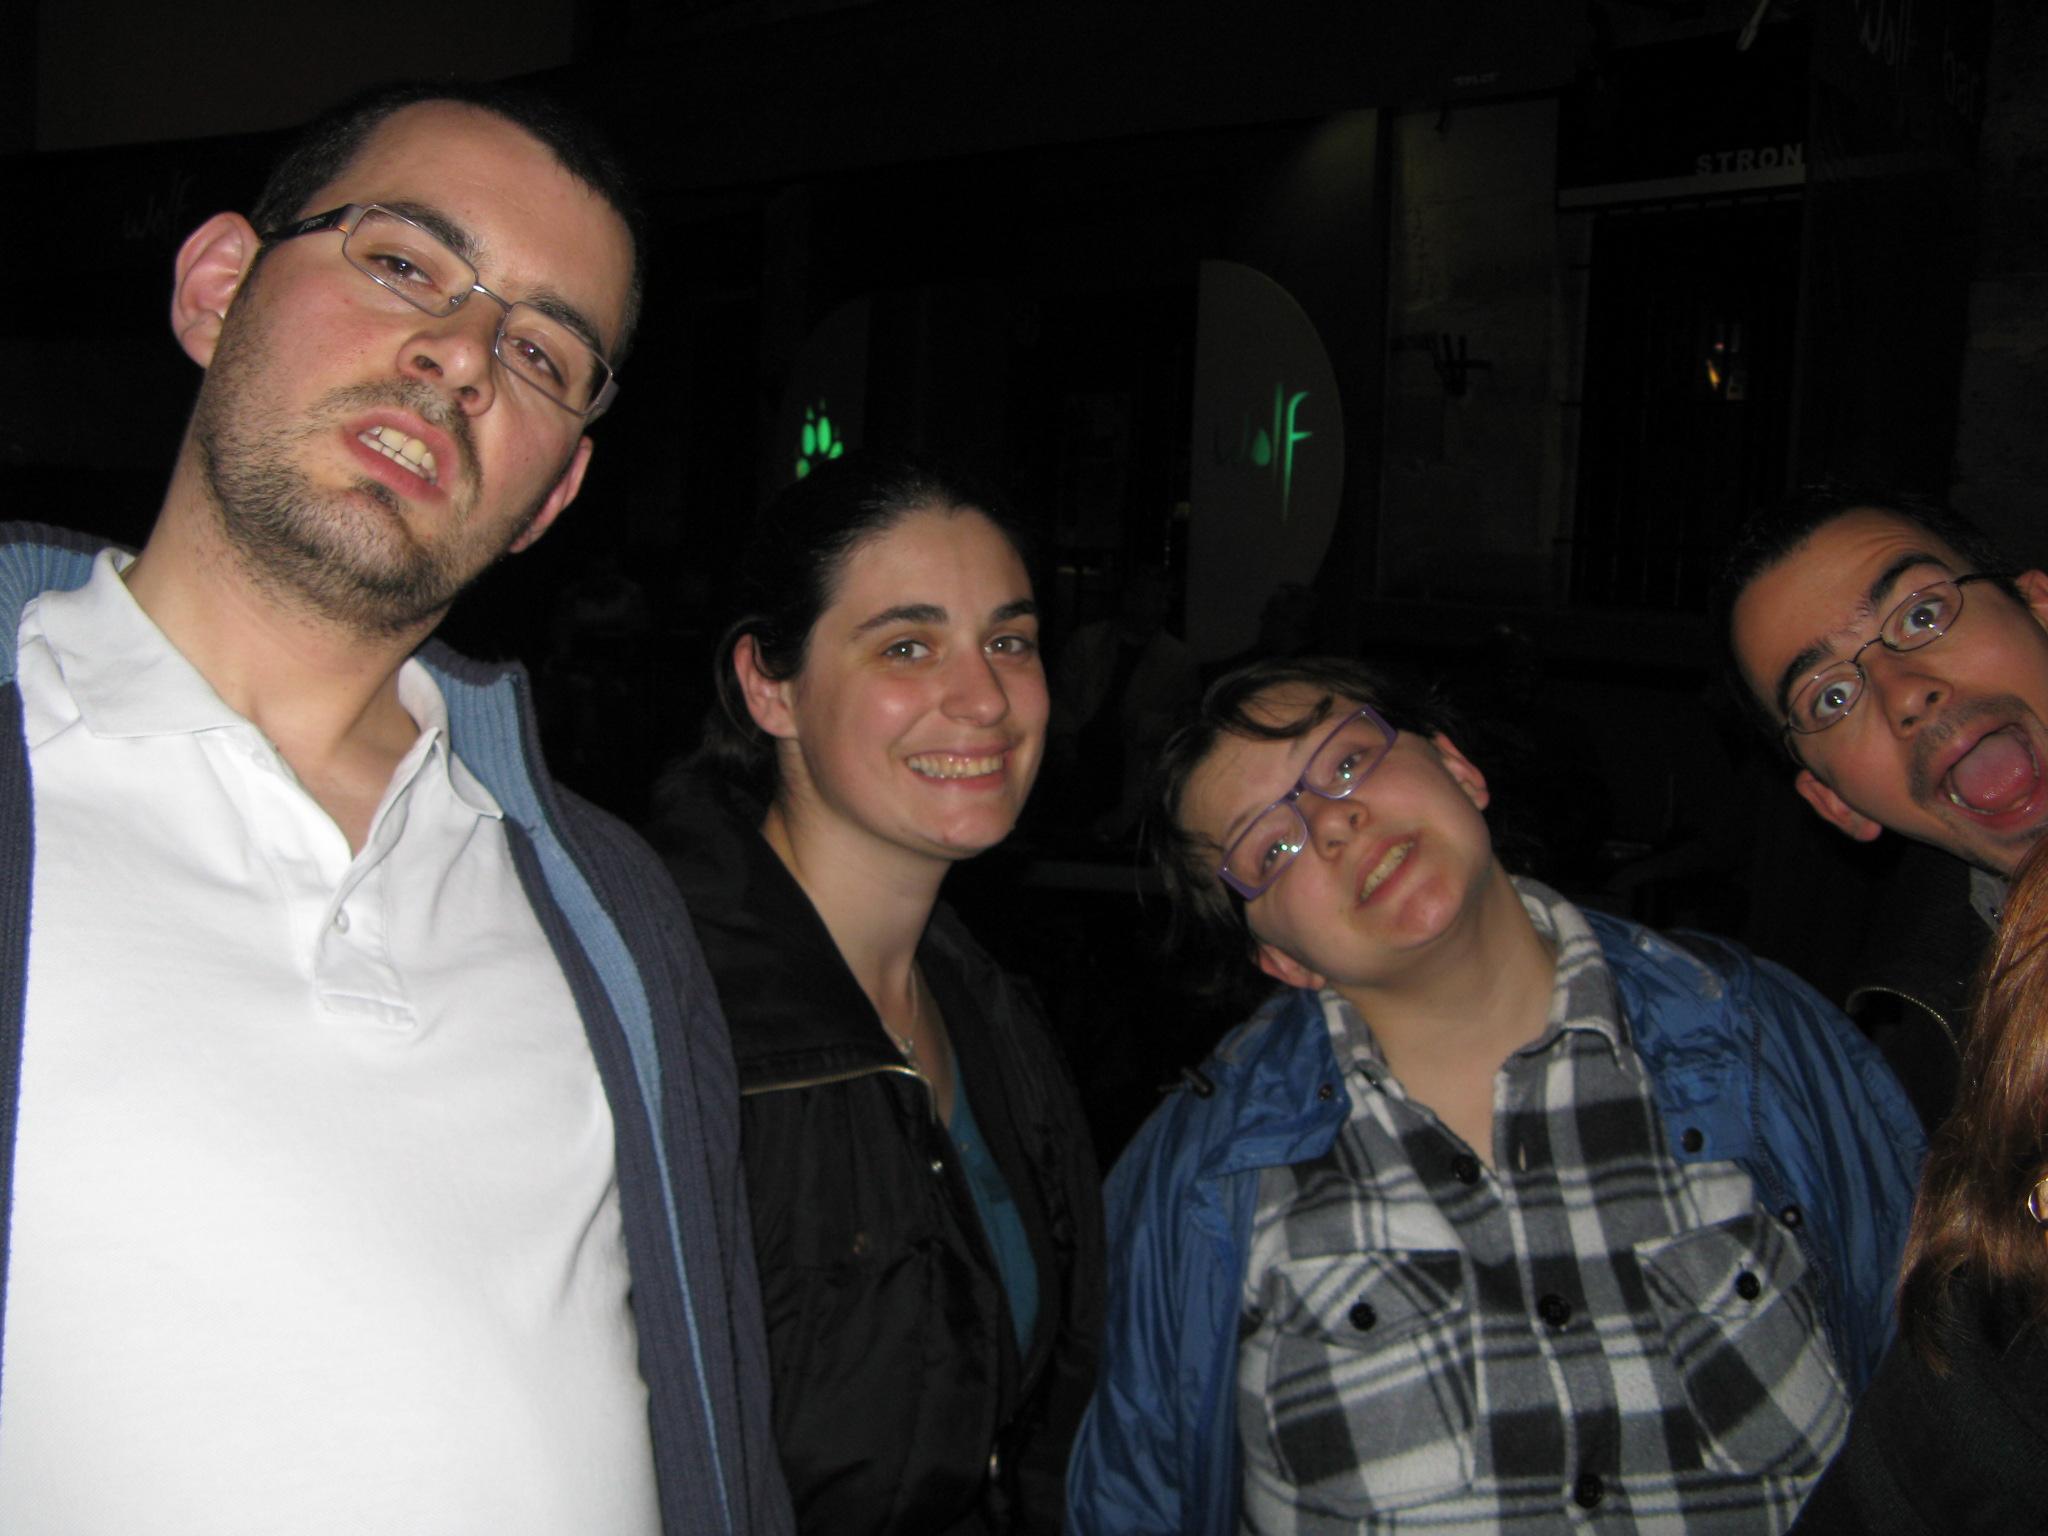 Photo 72 - boba.fett7, Kenda, Padmeia et Thrawn